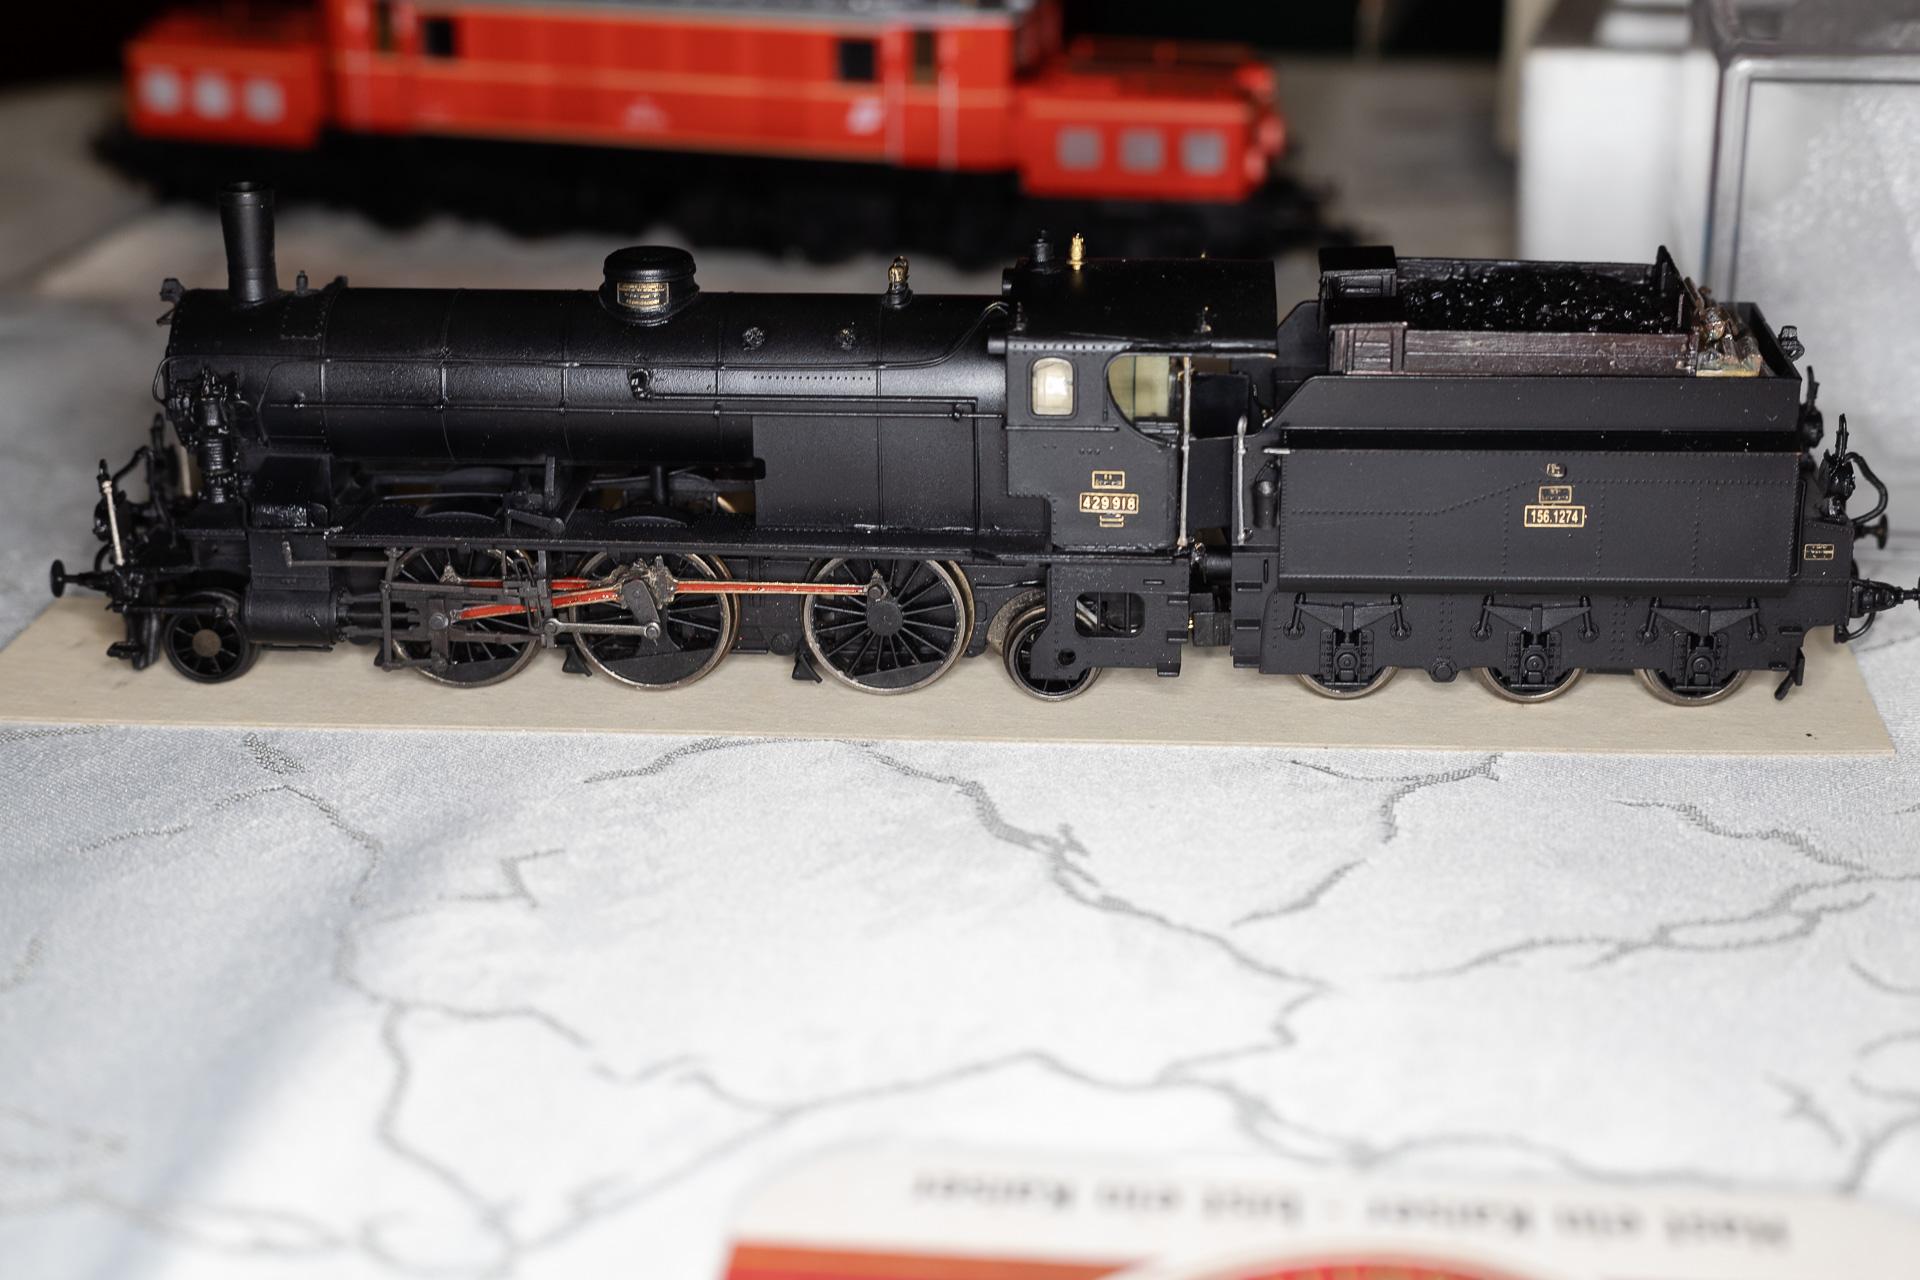 MG_4768